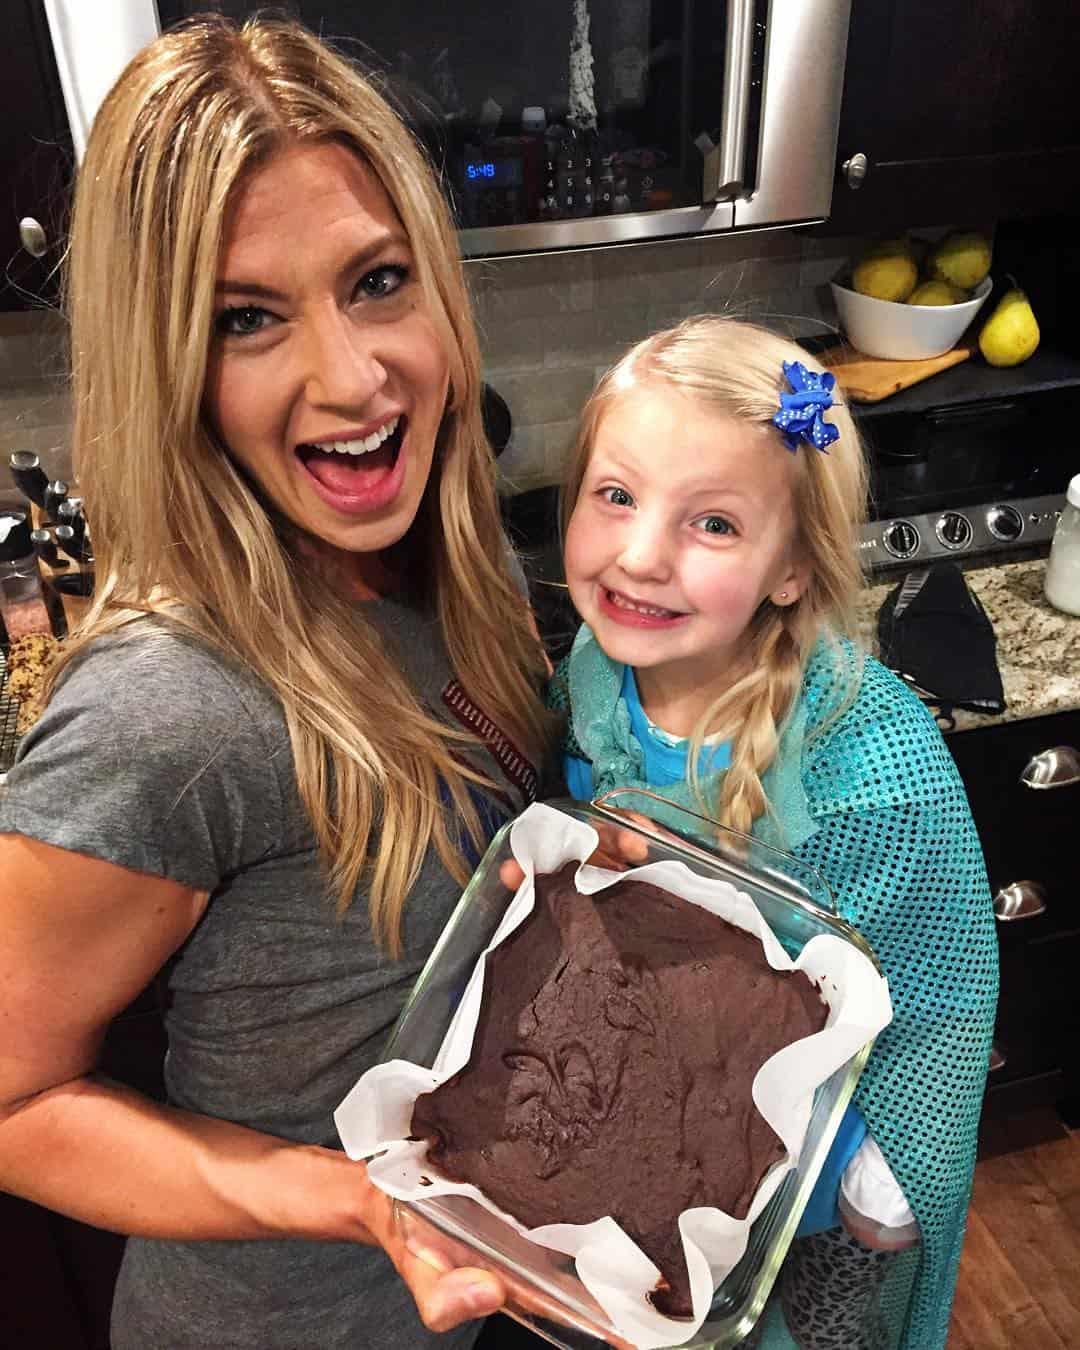 gluten-free recipes, gluten-free brownies, gluten-free snacks, gluten-free foods